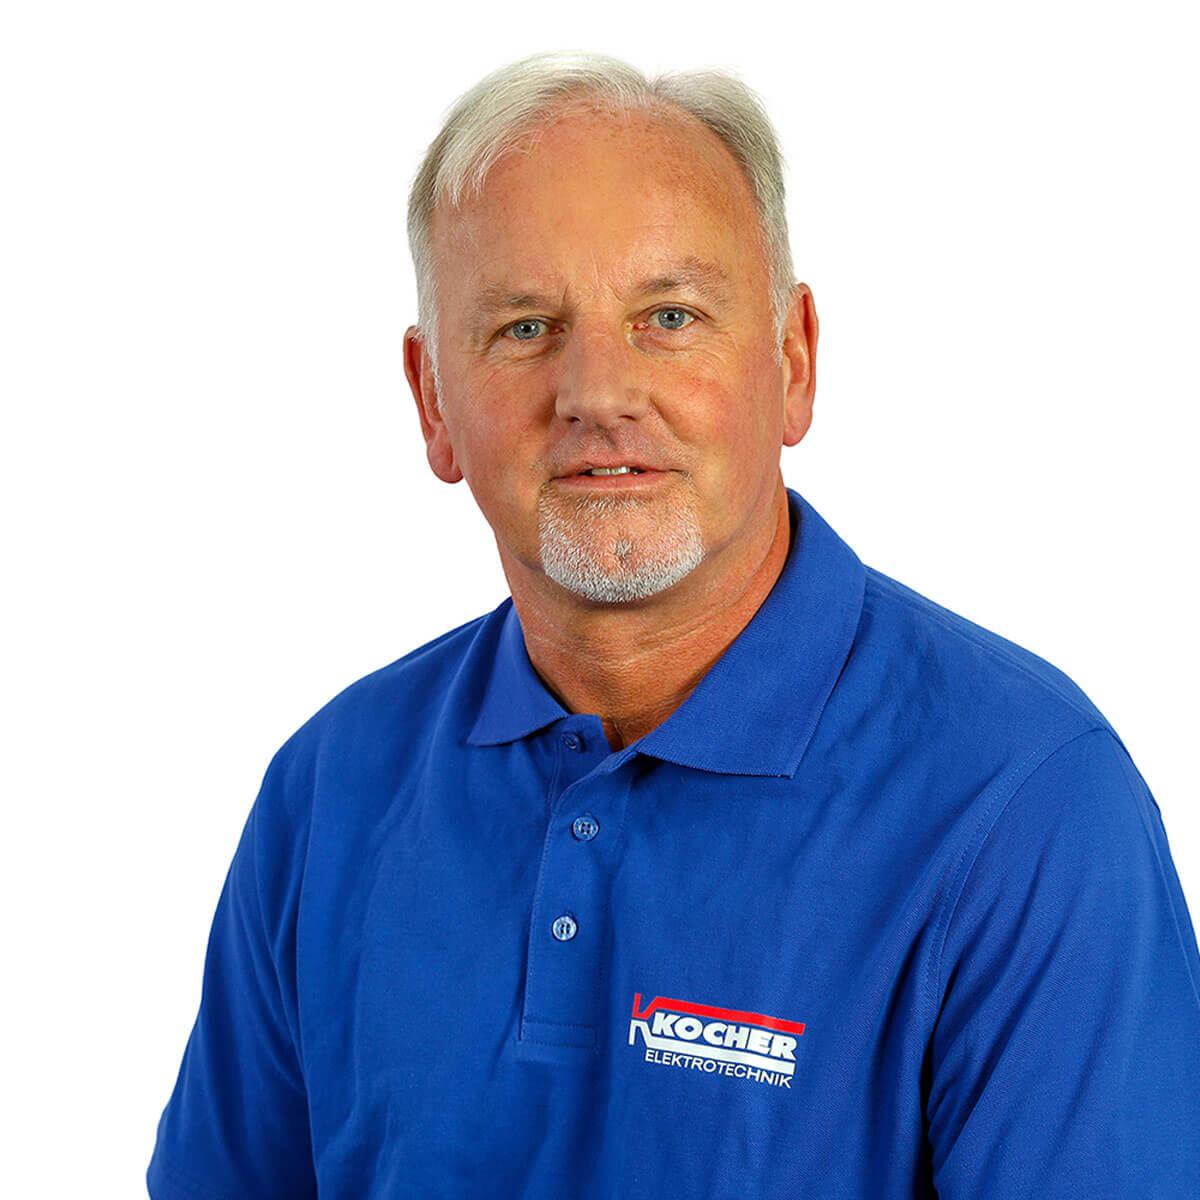 Harald Frei ist Obermonteur bei Kocher Elektrotechnik in Dortmund.